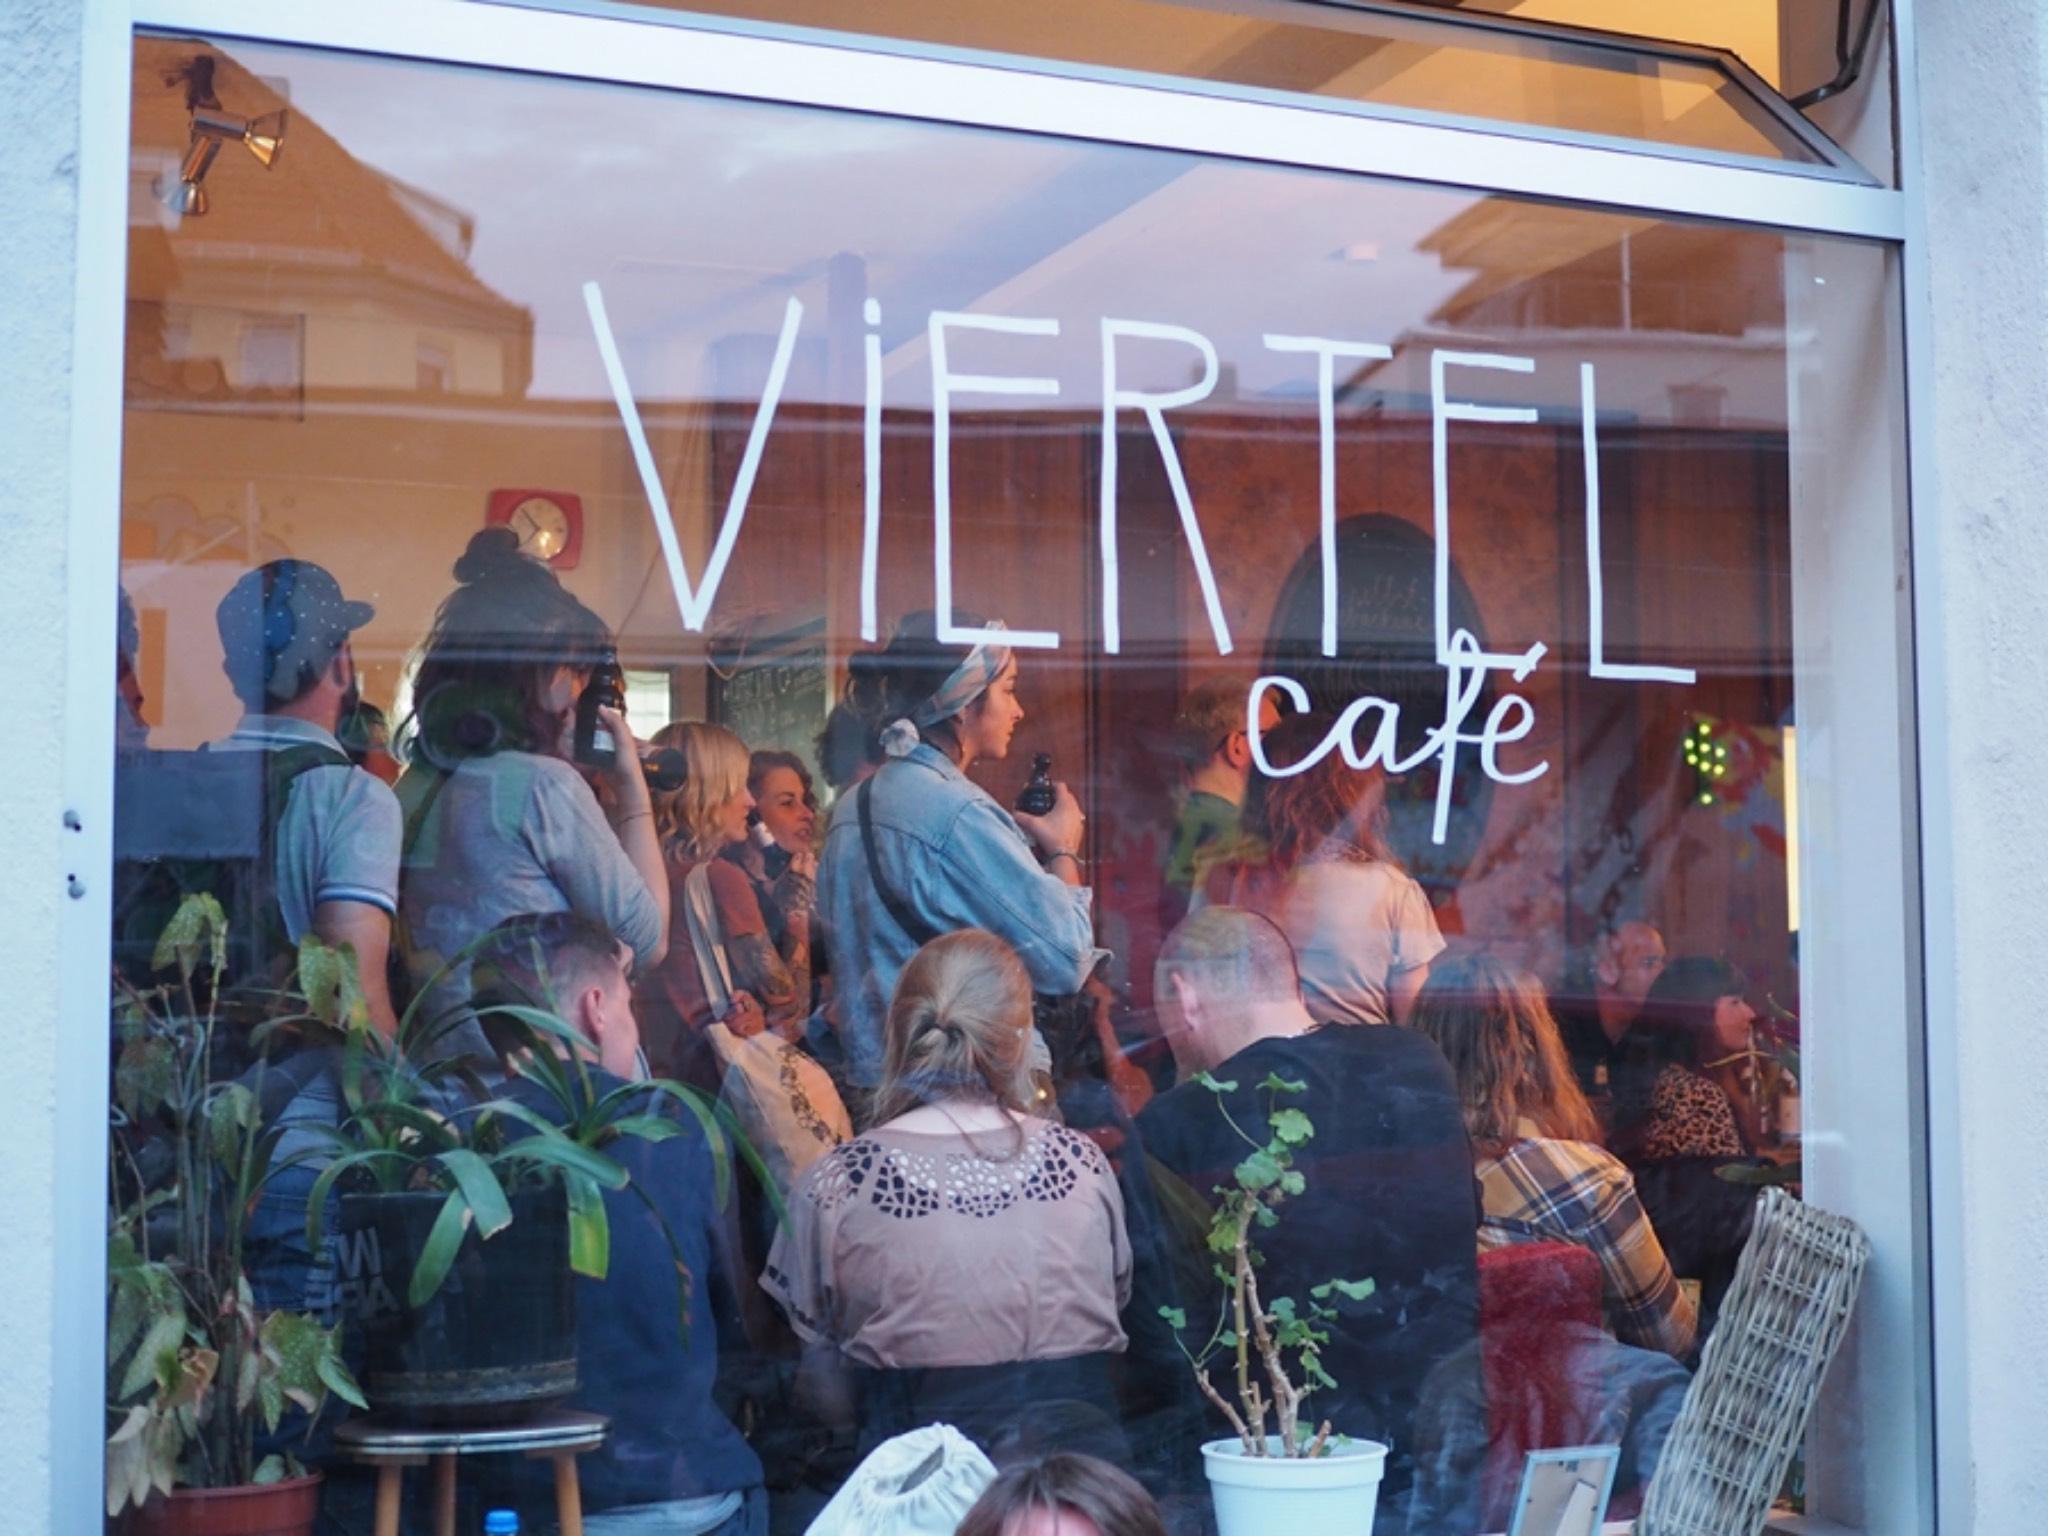 Das Viertelcafé ist an den Kulturtagen gut besucht. Foto: Nina Ditterich